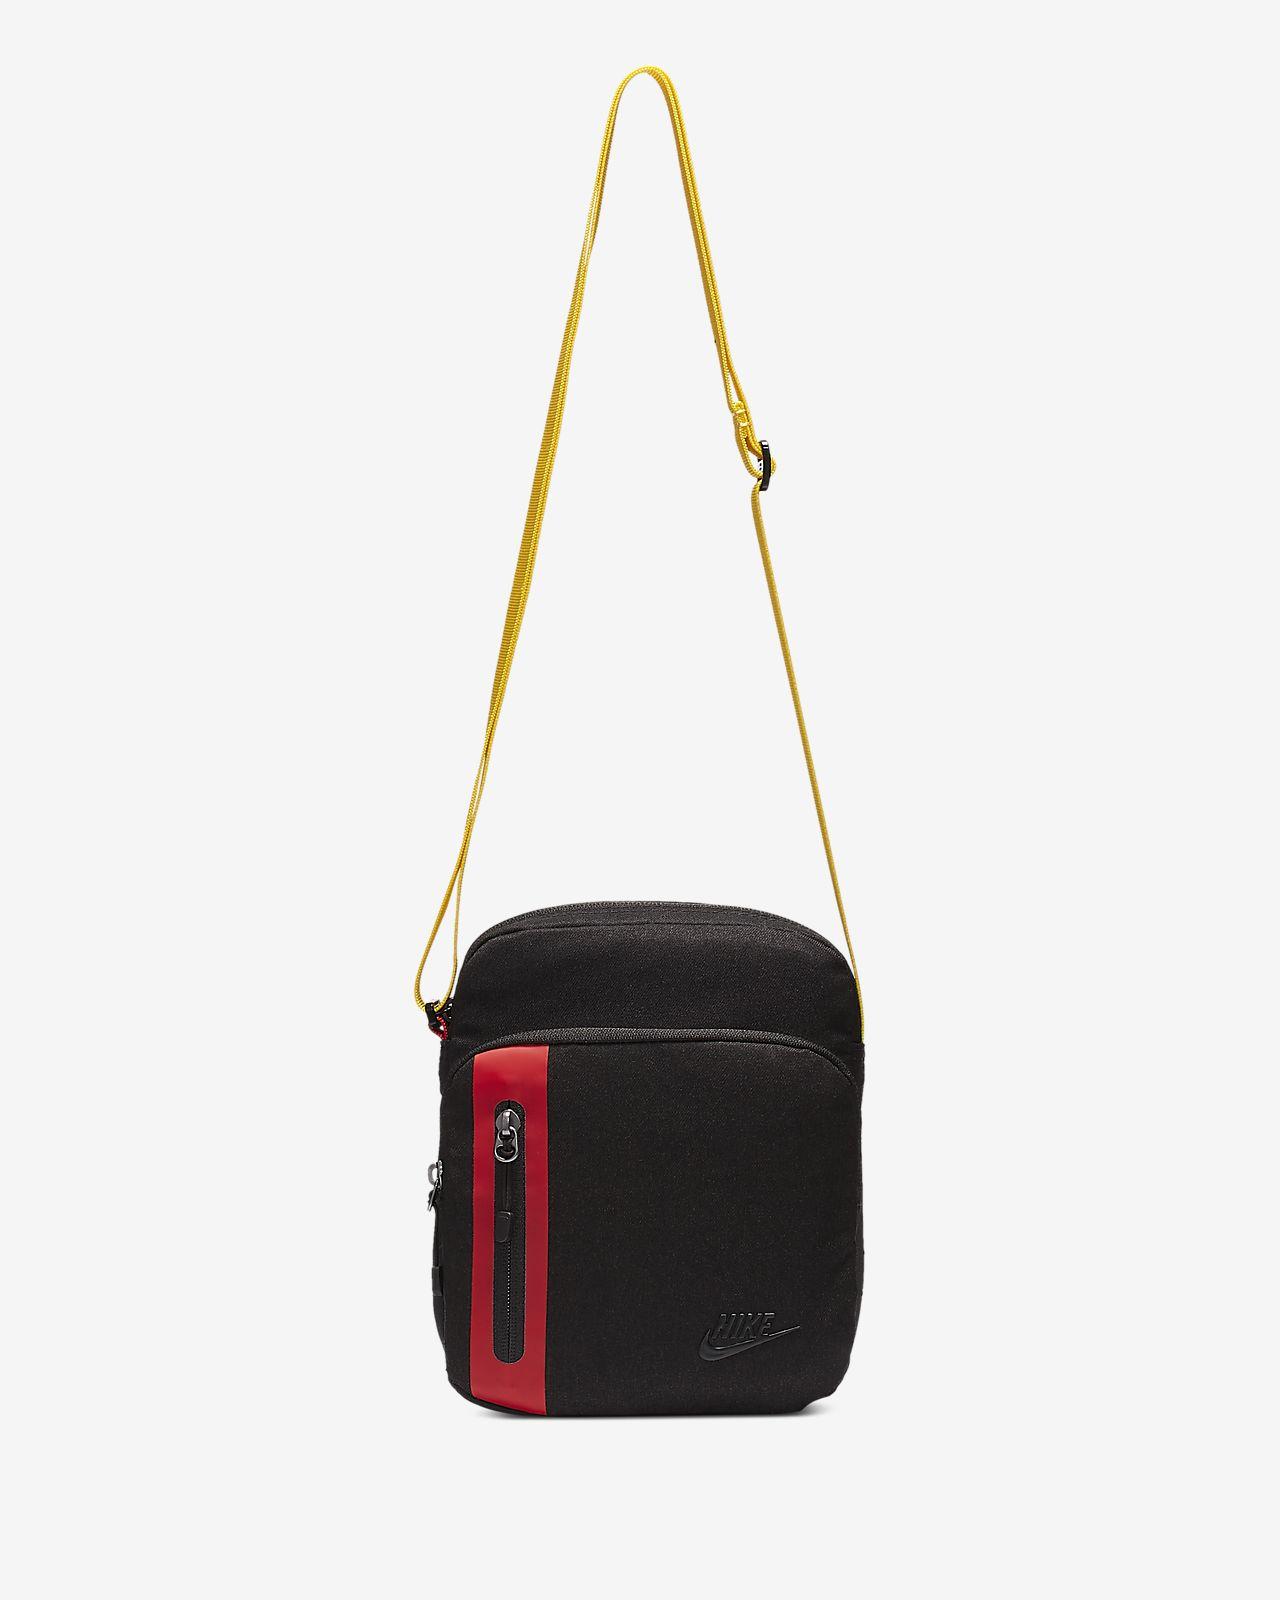 Nike Core Small Items 3.0 Tasche